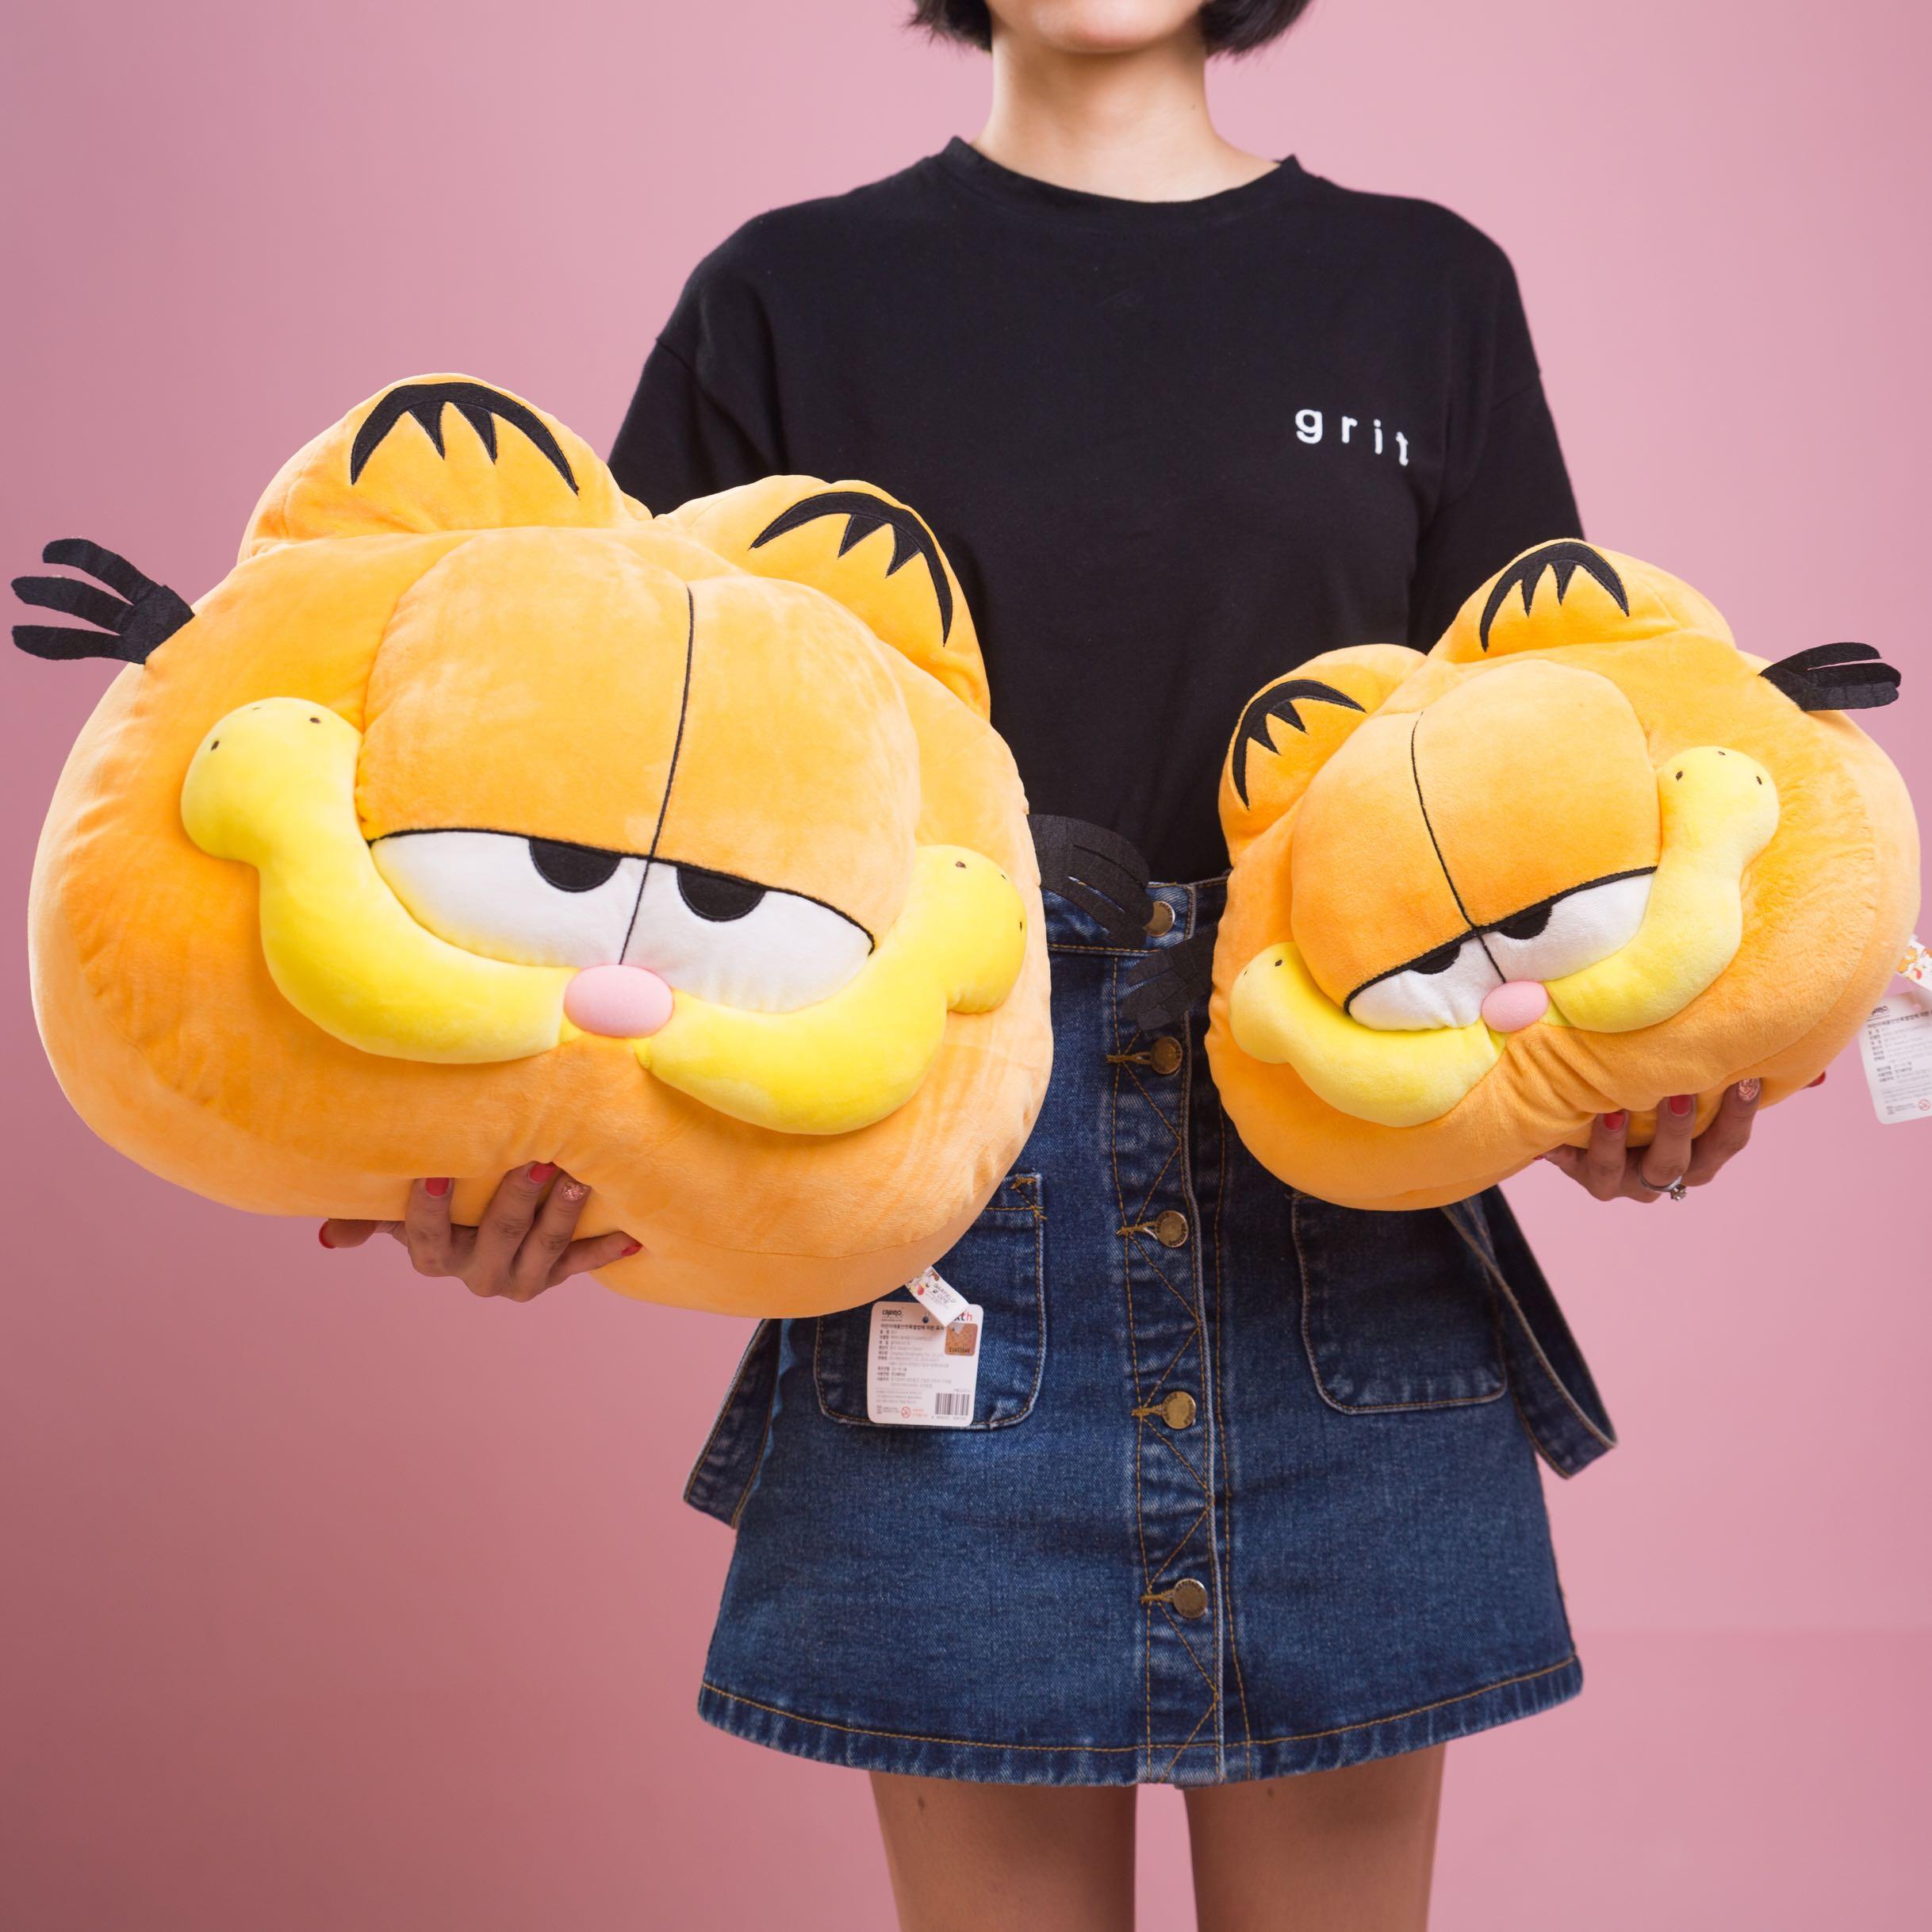 Cat Big Garfield Pet Cat Pillows Shorthair Animals Dolls Pendant Stuffed Plush Keyring, Key Holder Doll Gift Free Shipping